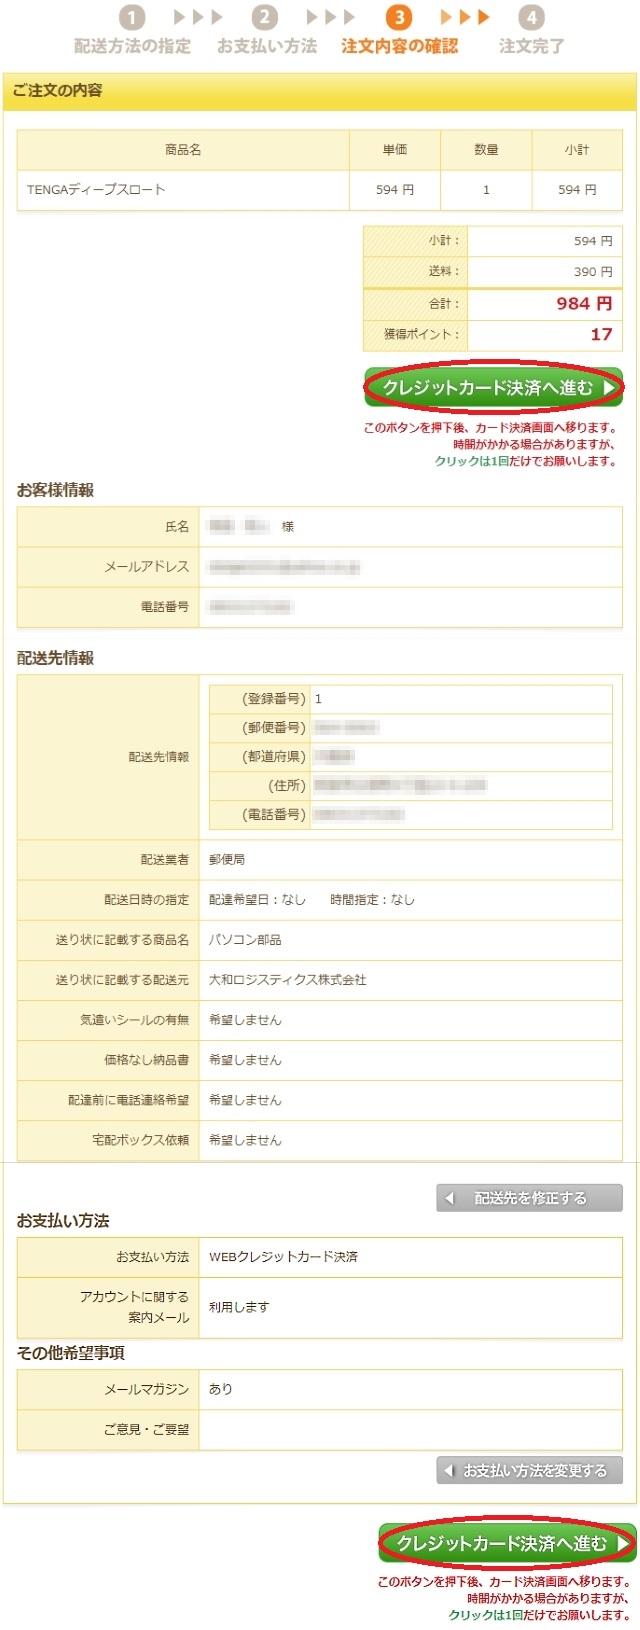 NLSで注文した商品の確認画面